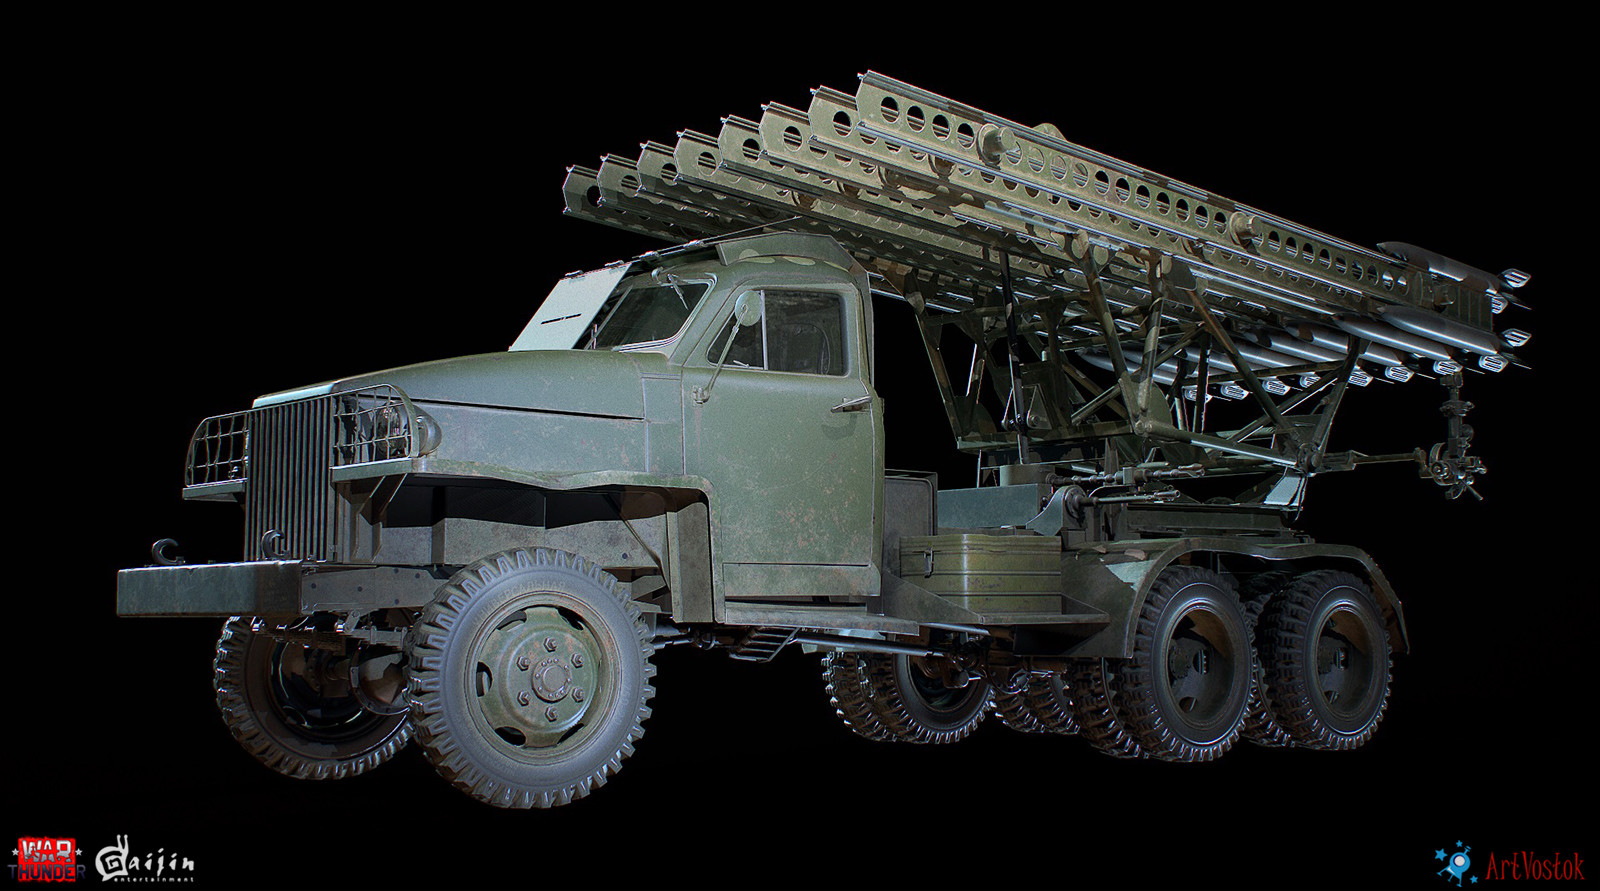 ArtVostok studio - BM-13N Katyusha rocket launcher